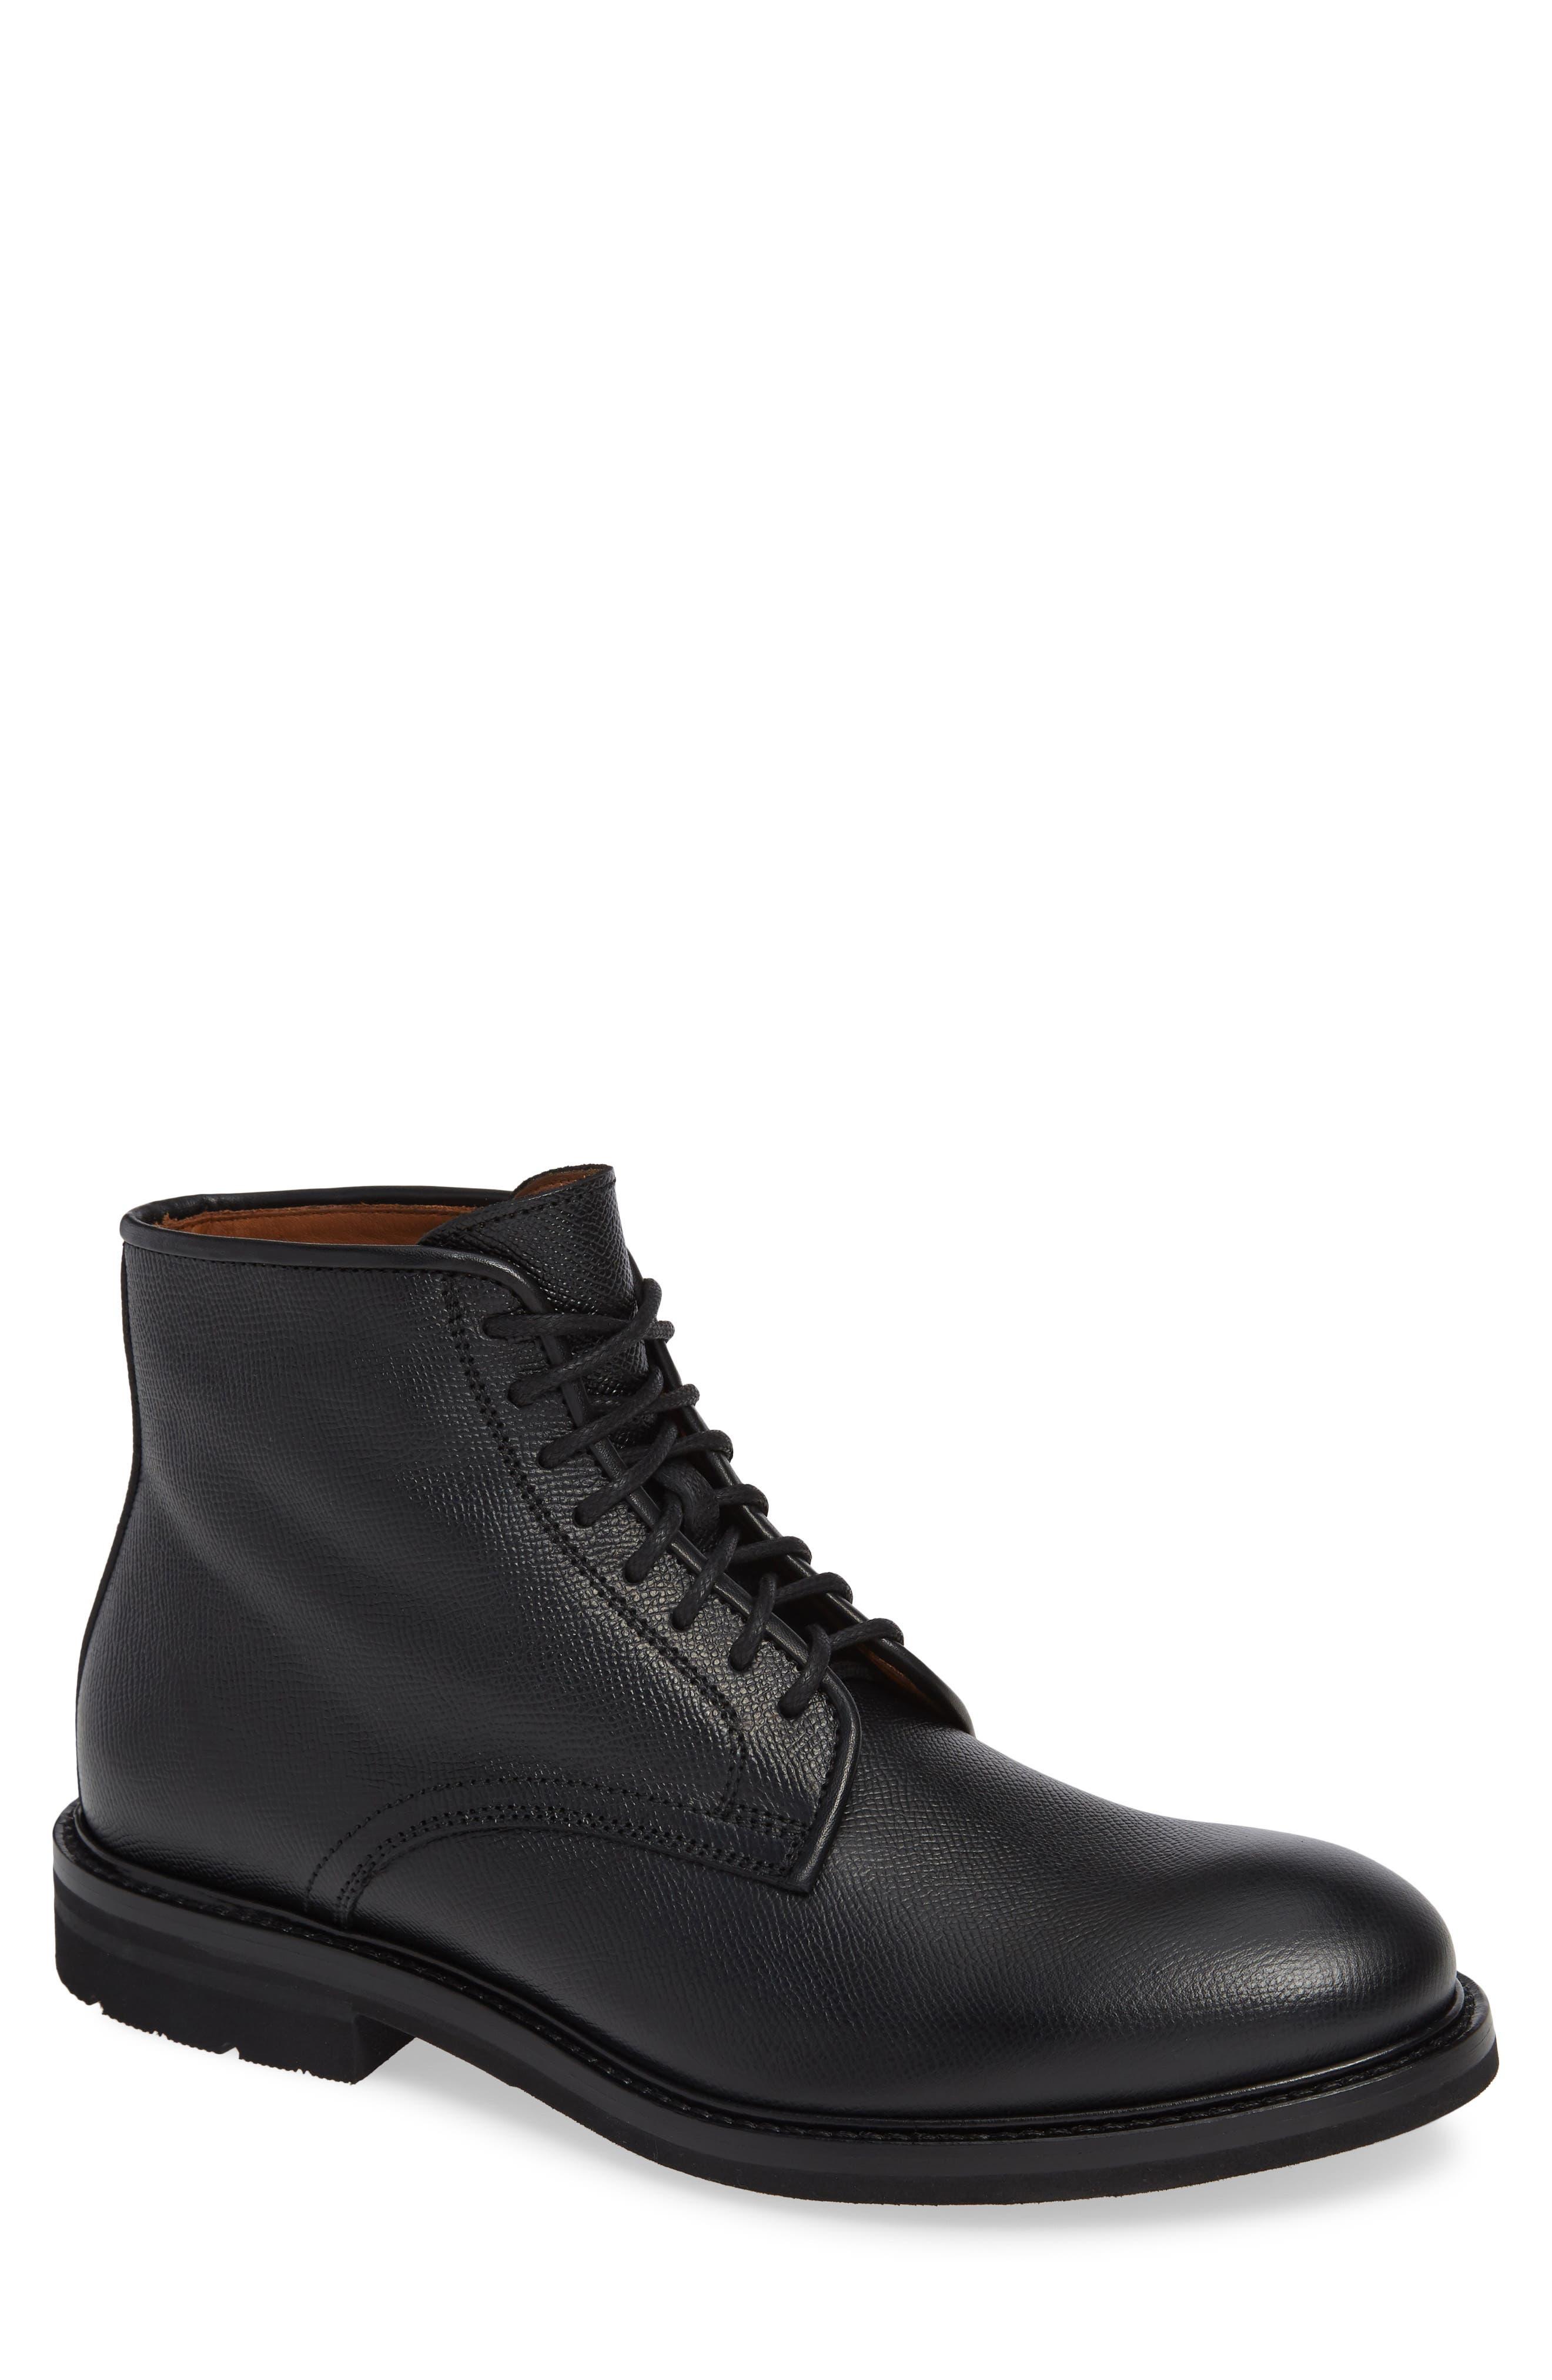 Renzo Weatherproof Plain Toe Waterproof Boot,                             Main thumbnail 1, color,                             BLACK